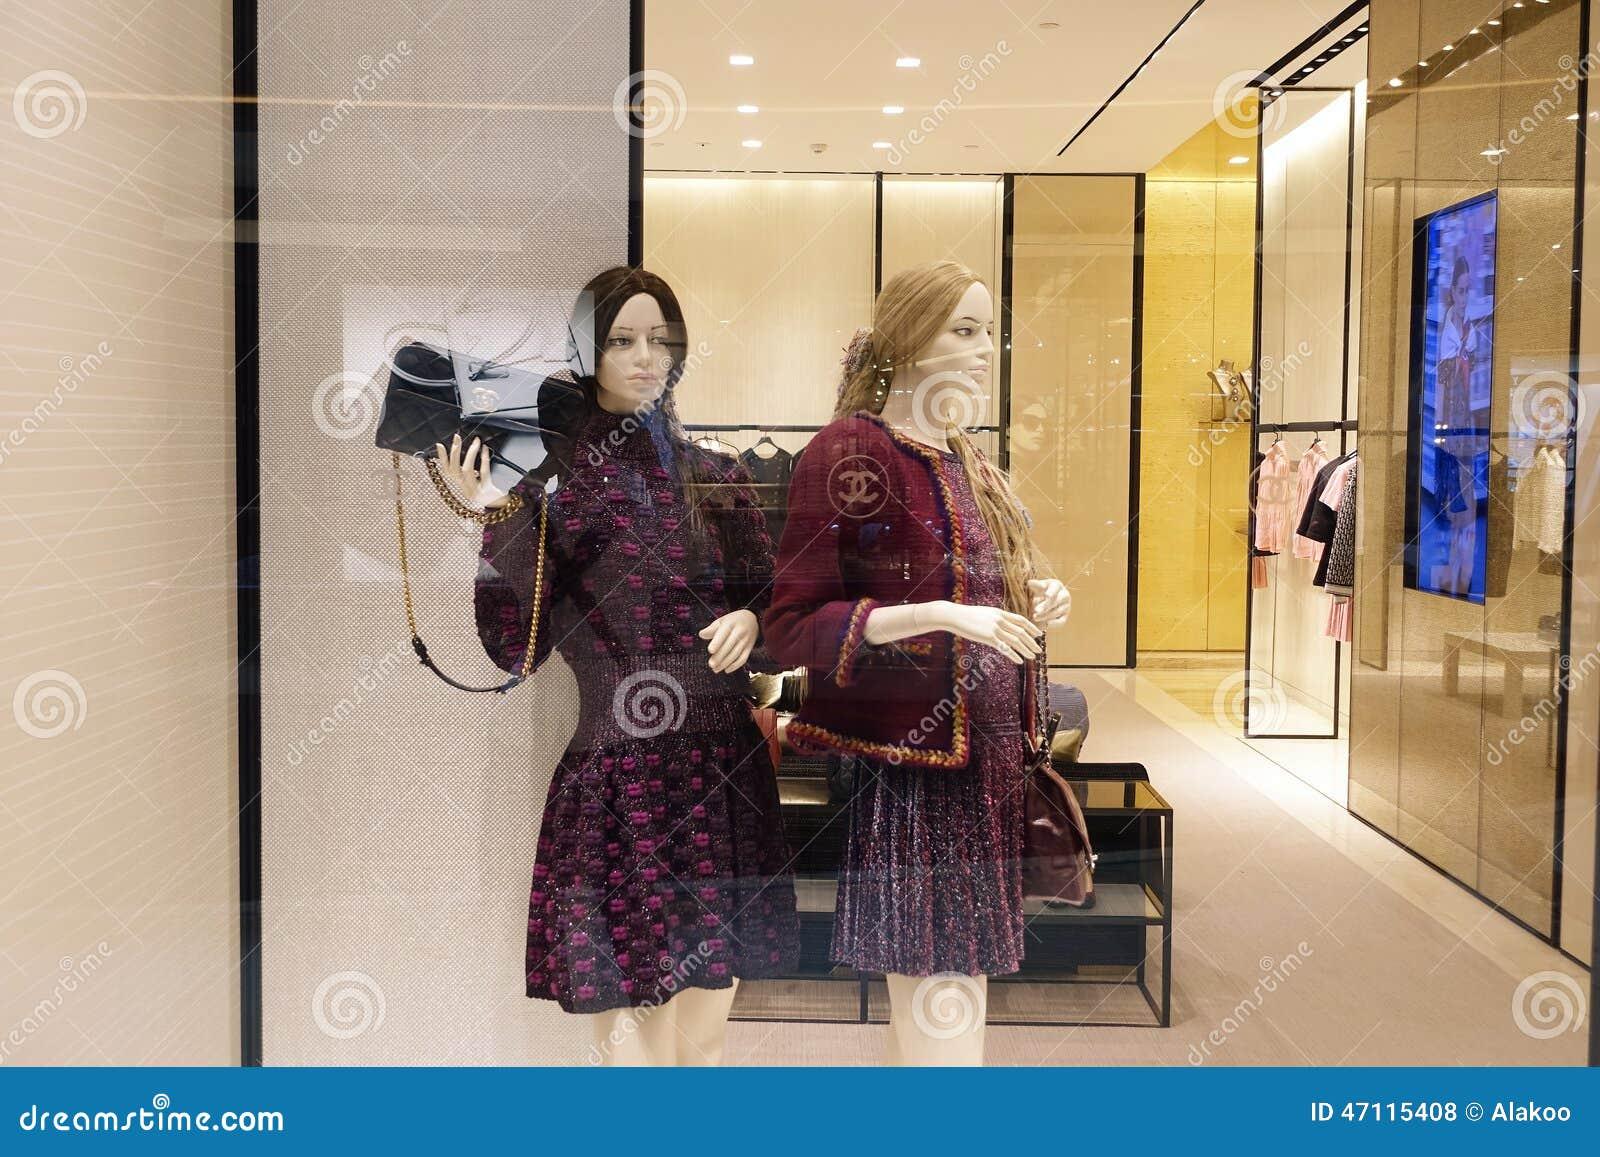 72dfe8c9e5f3e Fashion Boutique Clothing Shop Window Clothes Store Editorial Stock ...